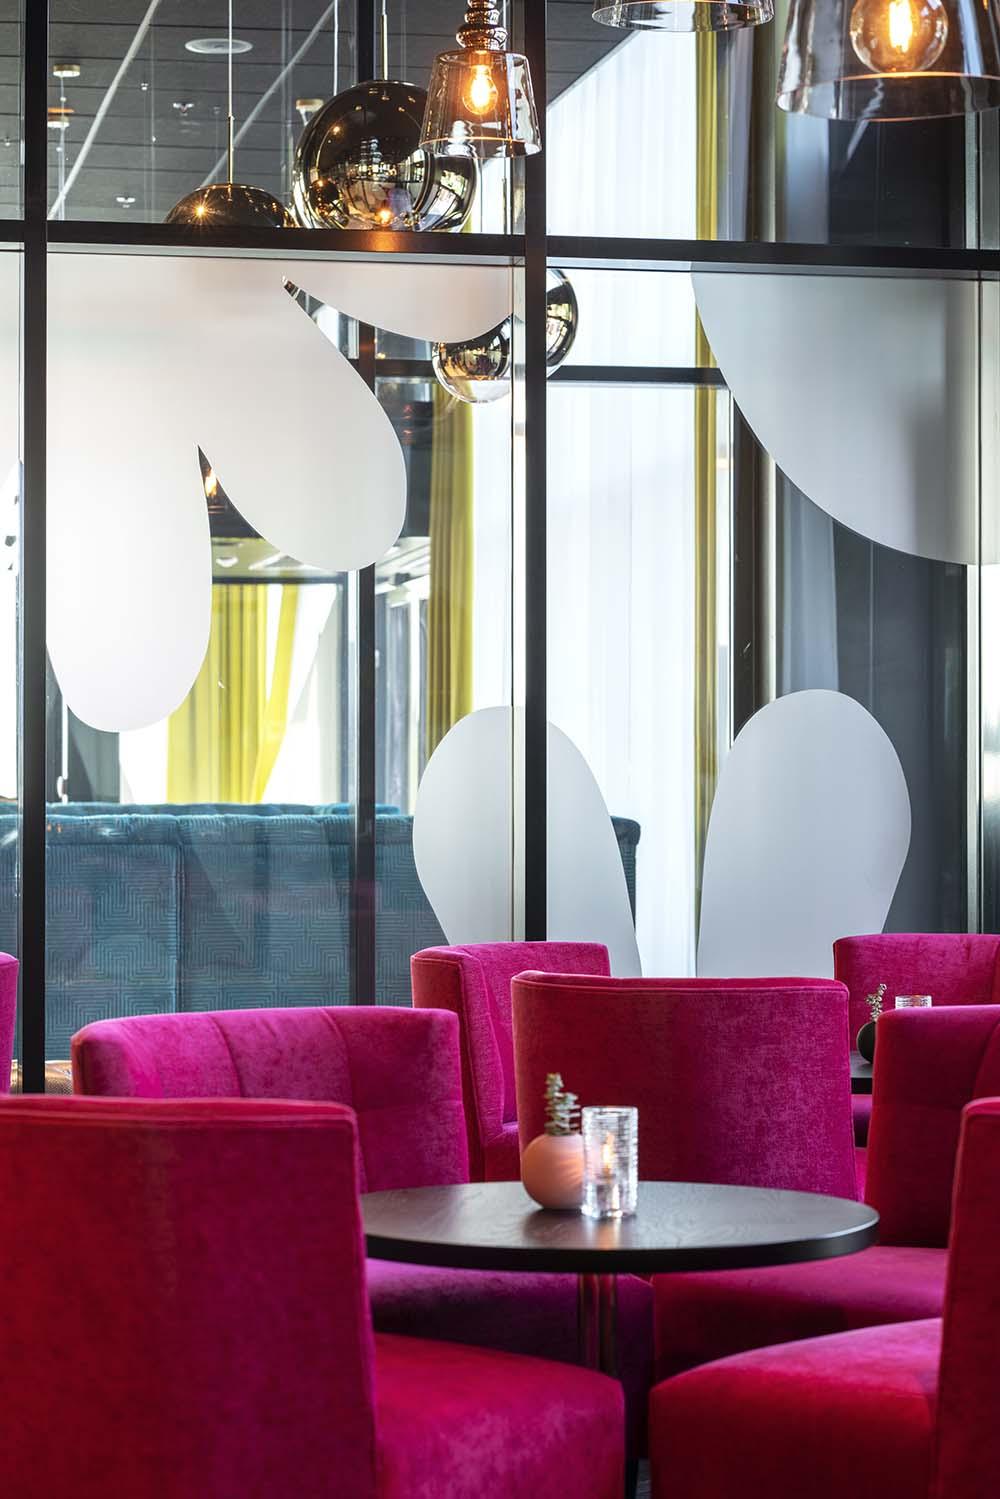 konferansehotell, stoler, lounge, sittegruppe, lys